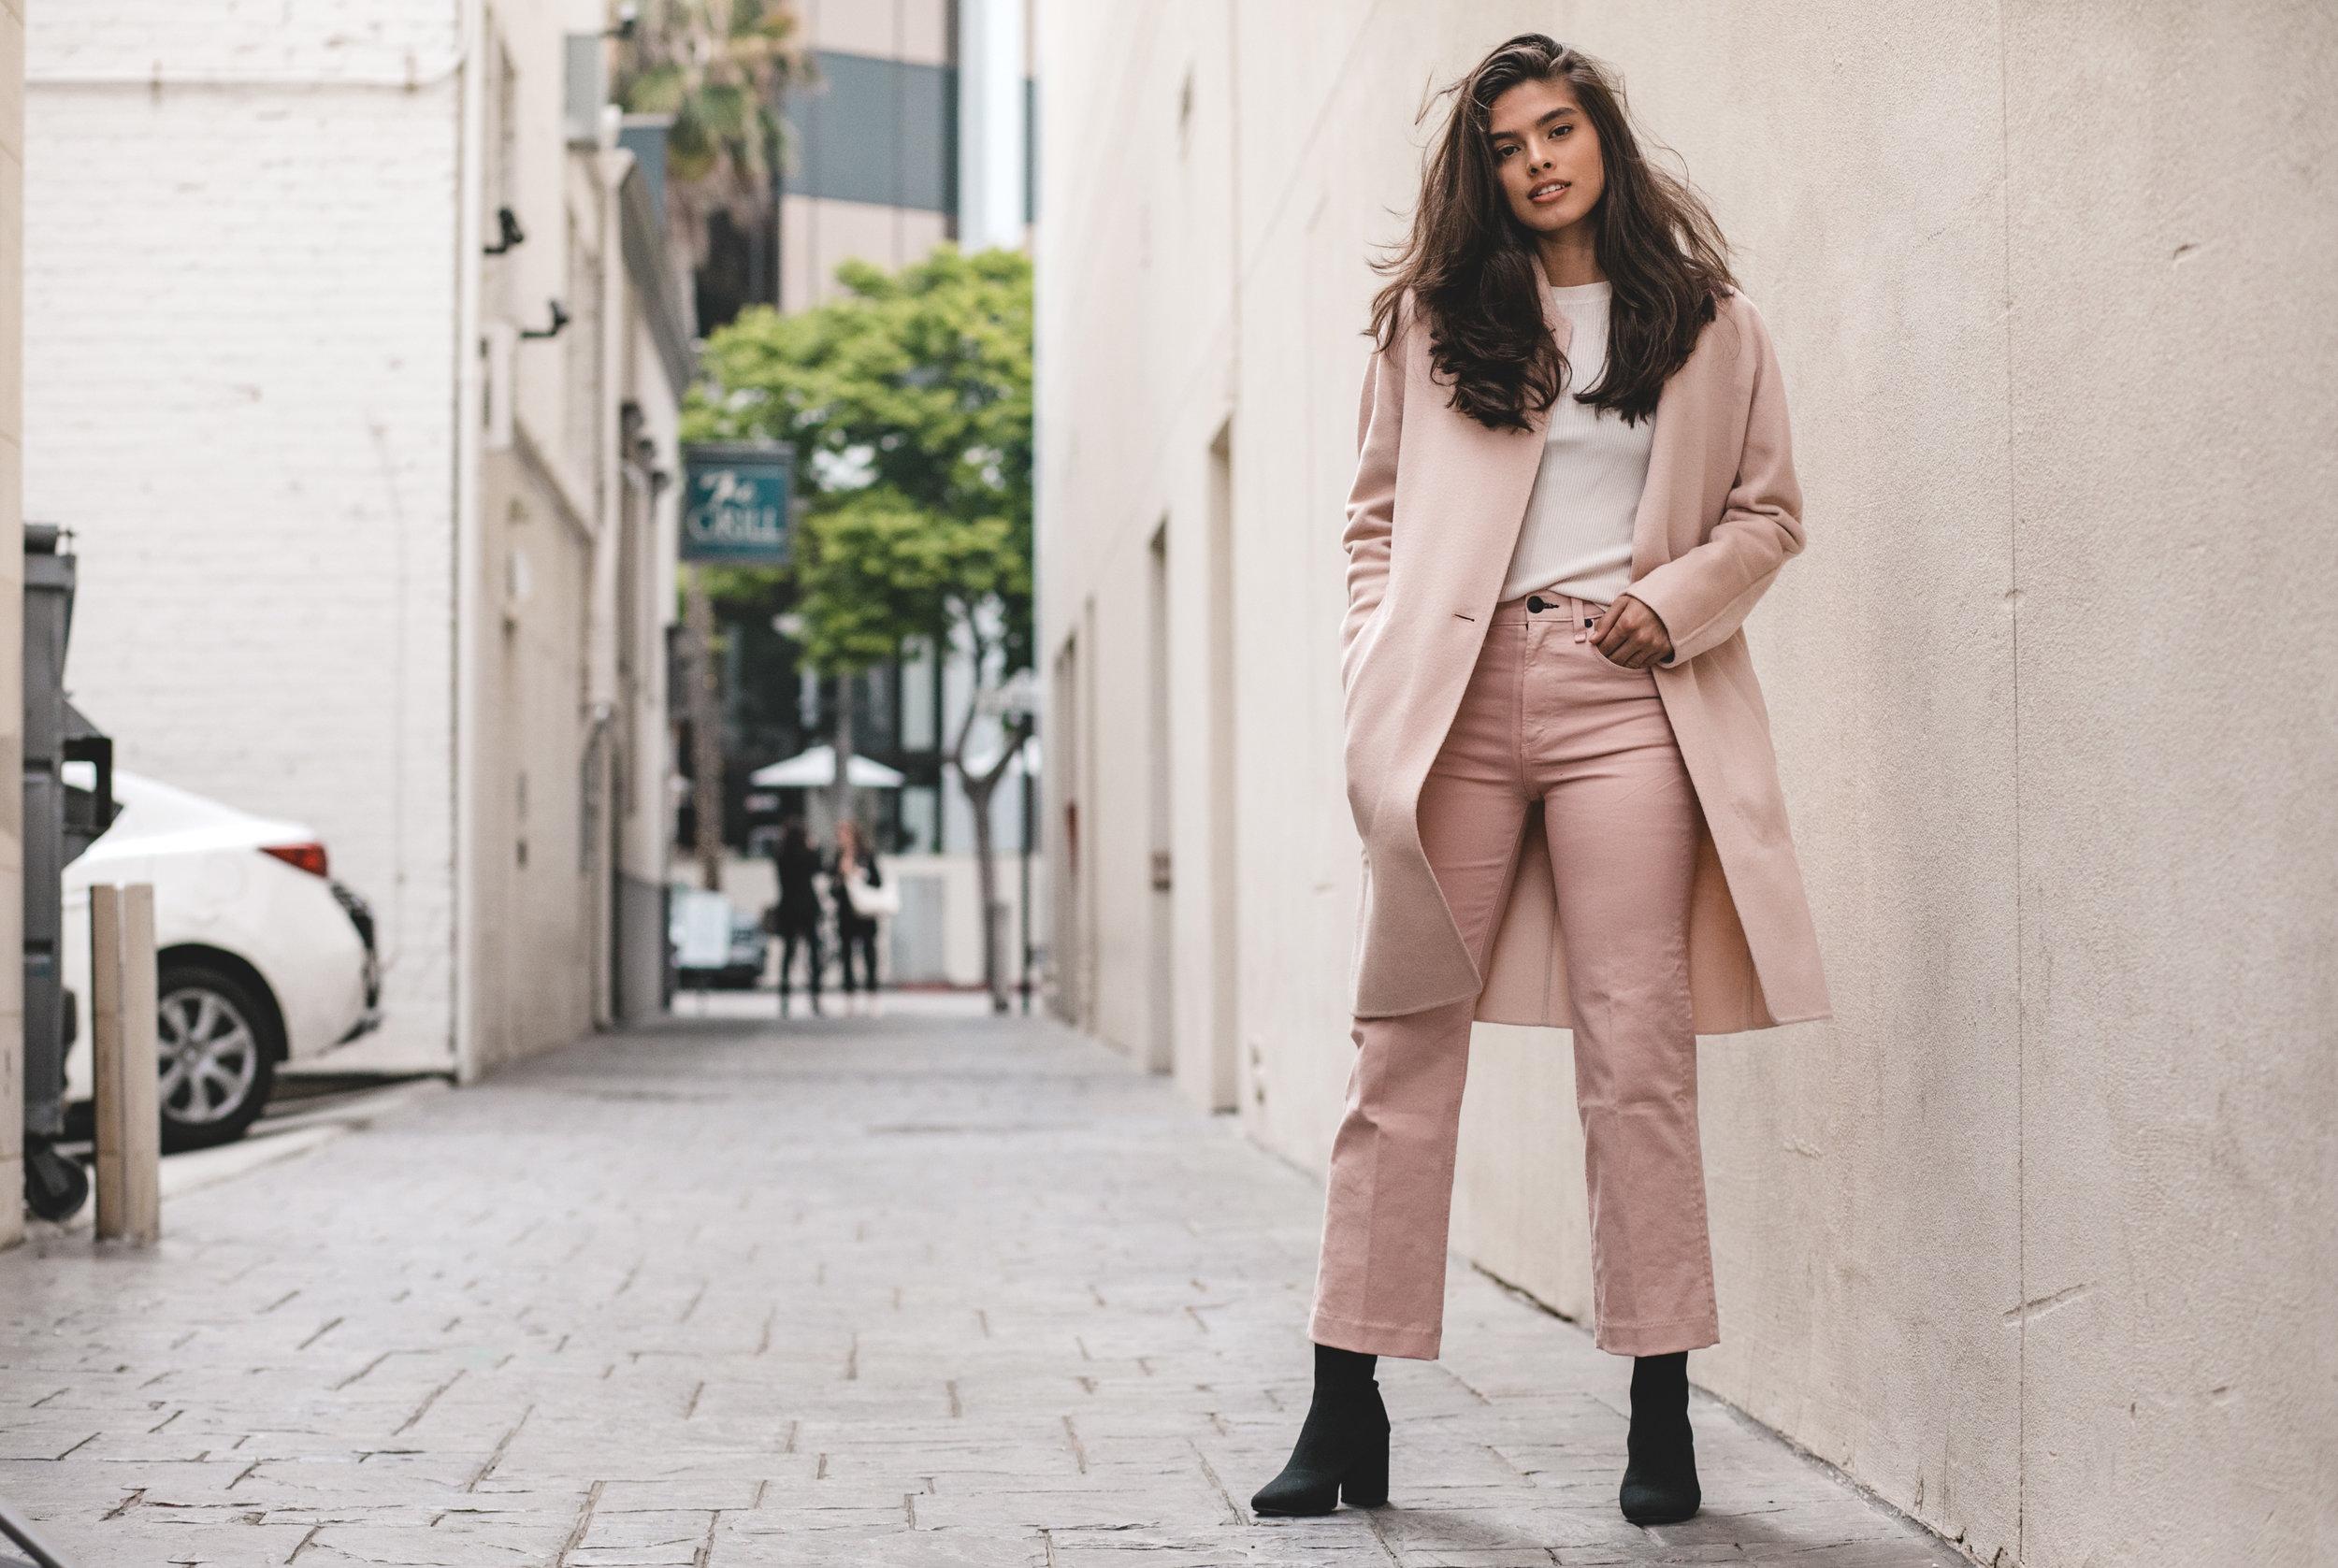 Beverly Hills Street Fashion